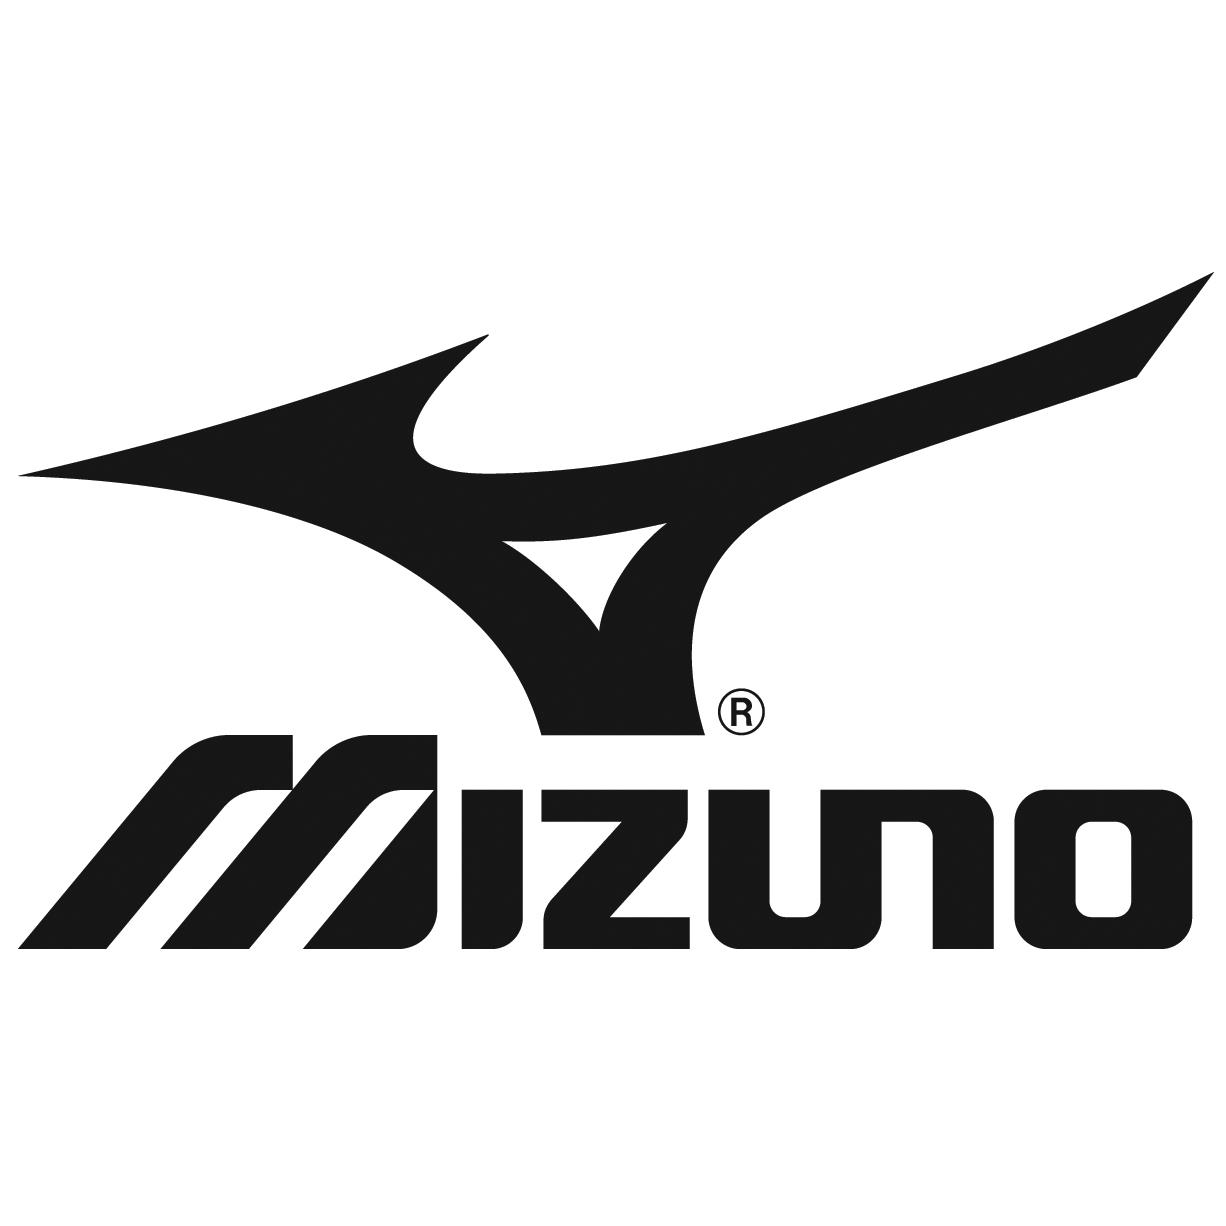 File:Mizuno logo.jpg - Wikimedia Commons